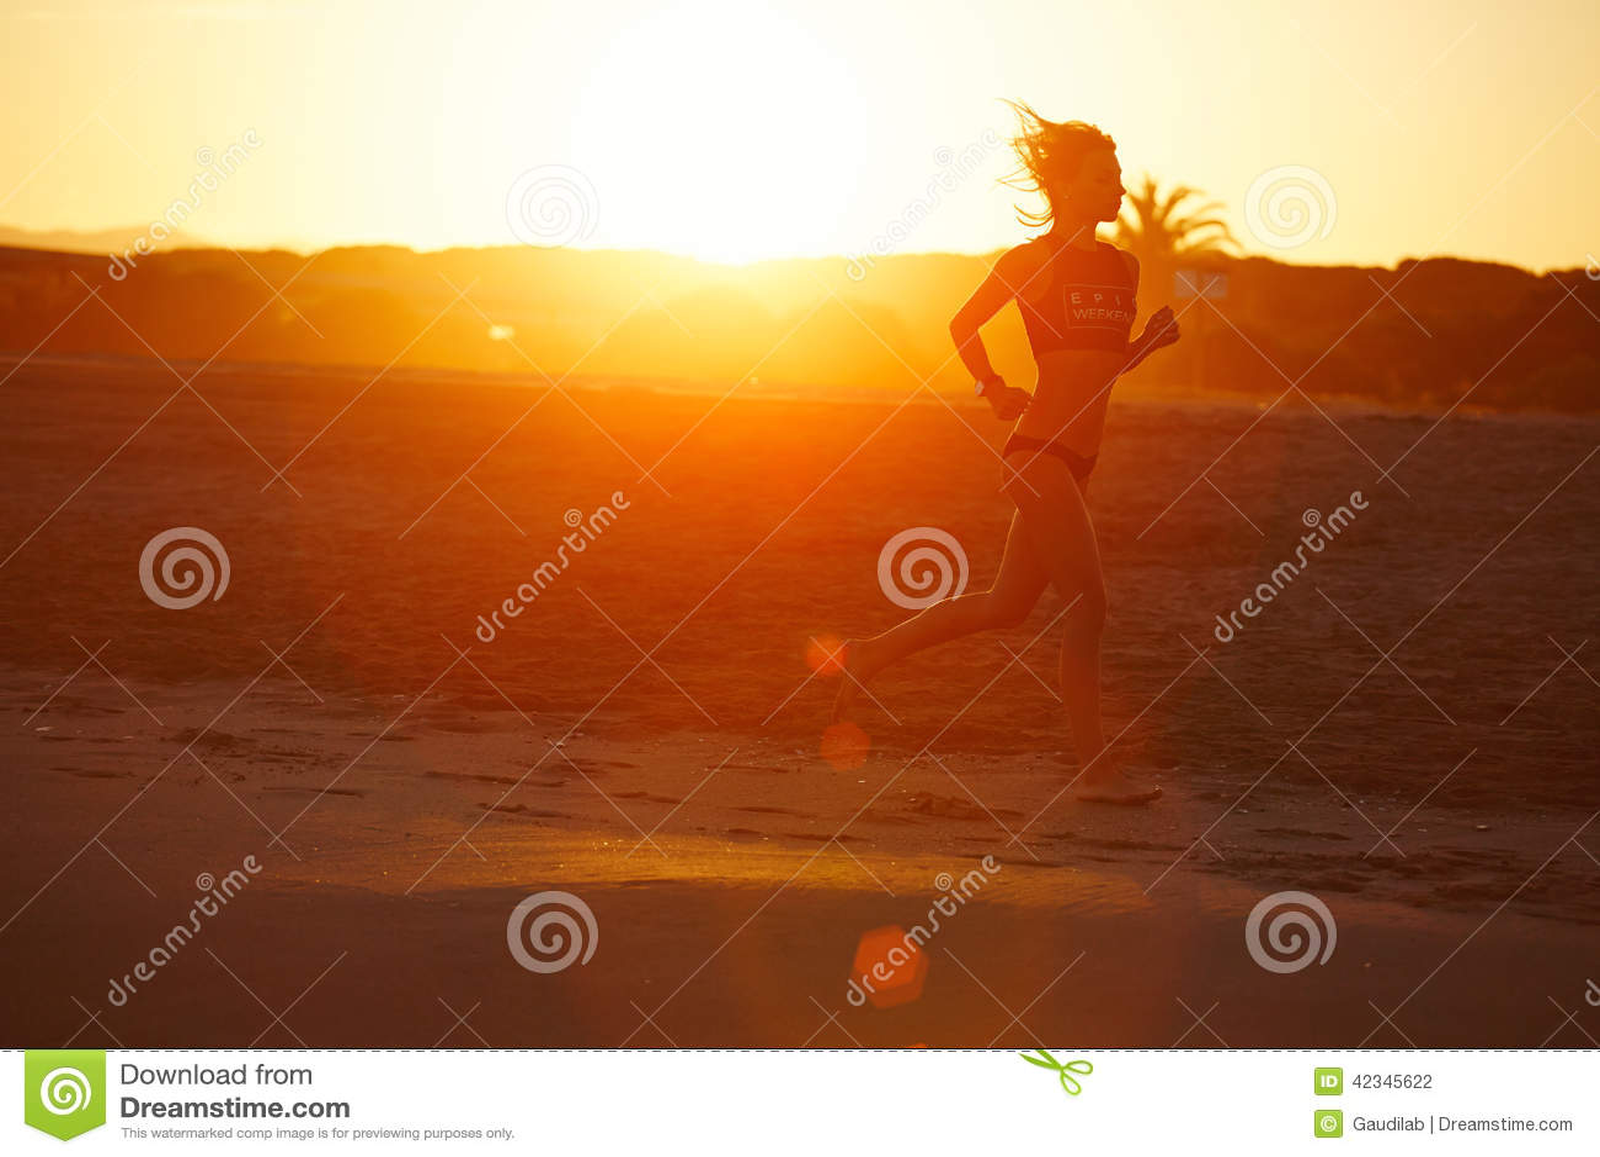 Silhouette of athletic female runner running along the beach an amazing orange sunset on background